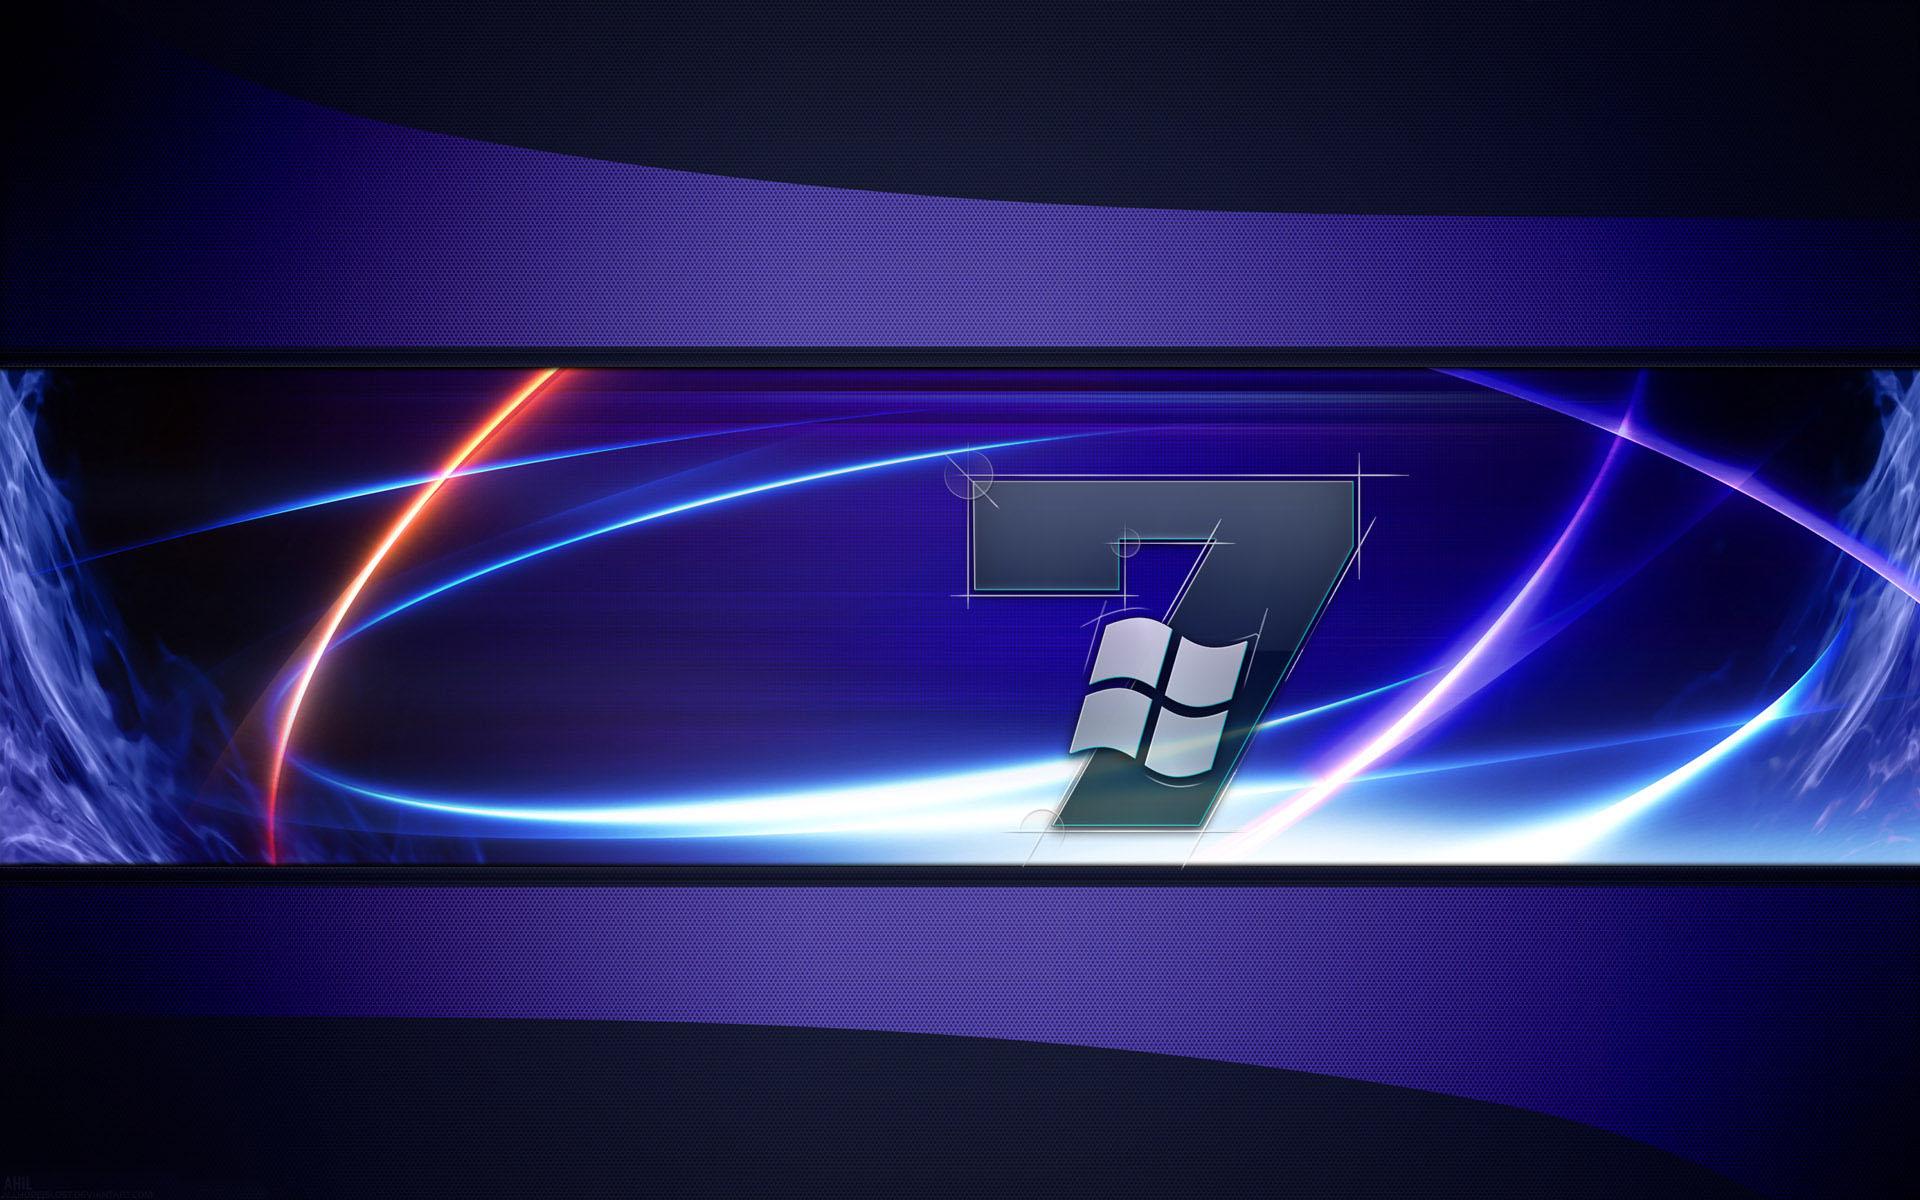 Papéis De Parede Do Windows 7